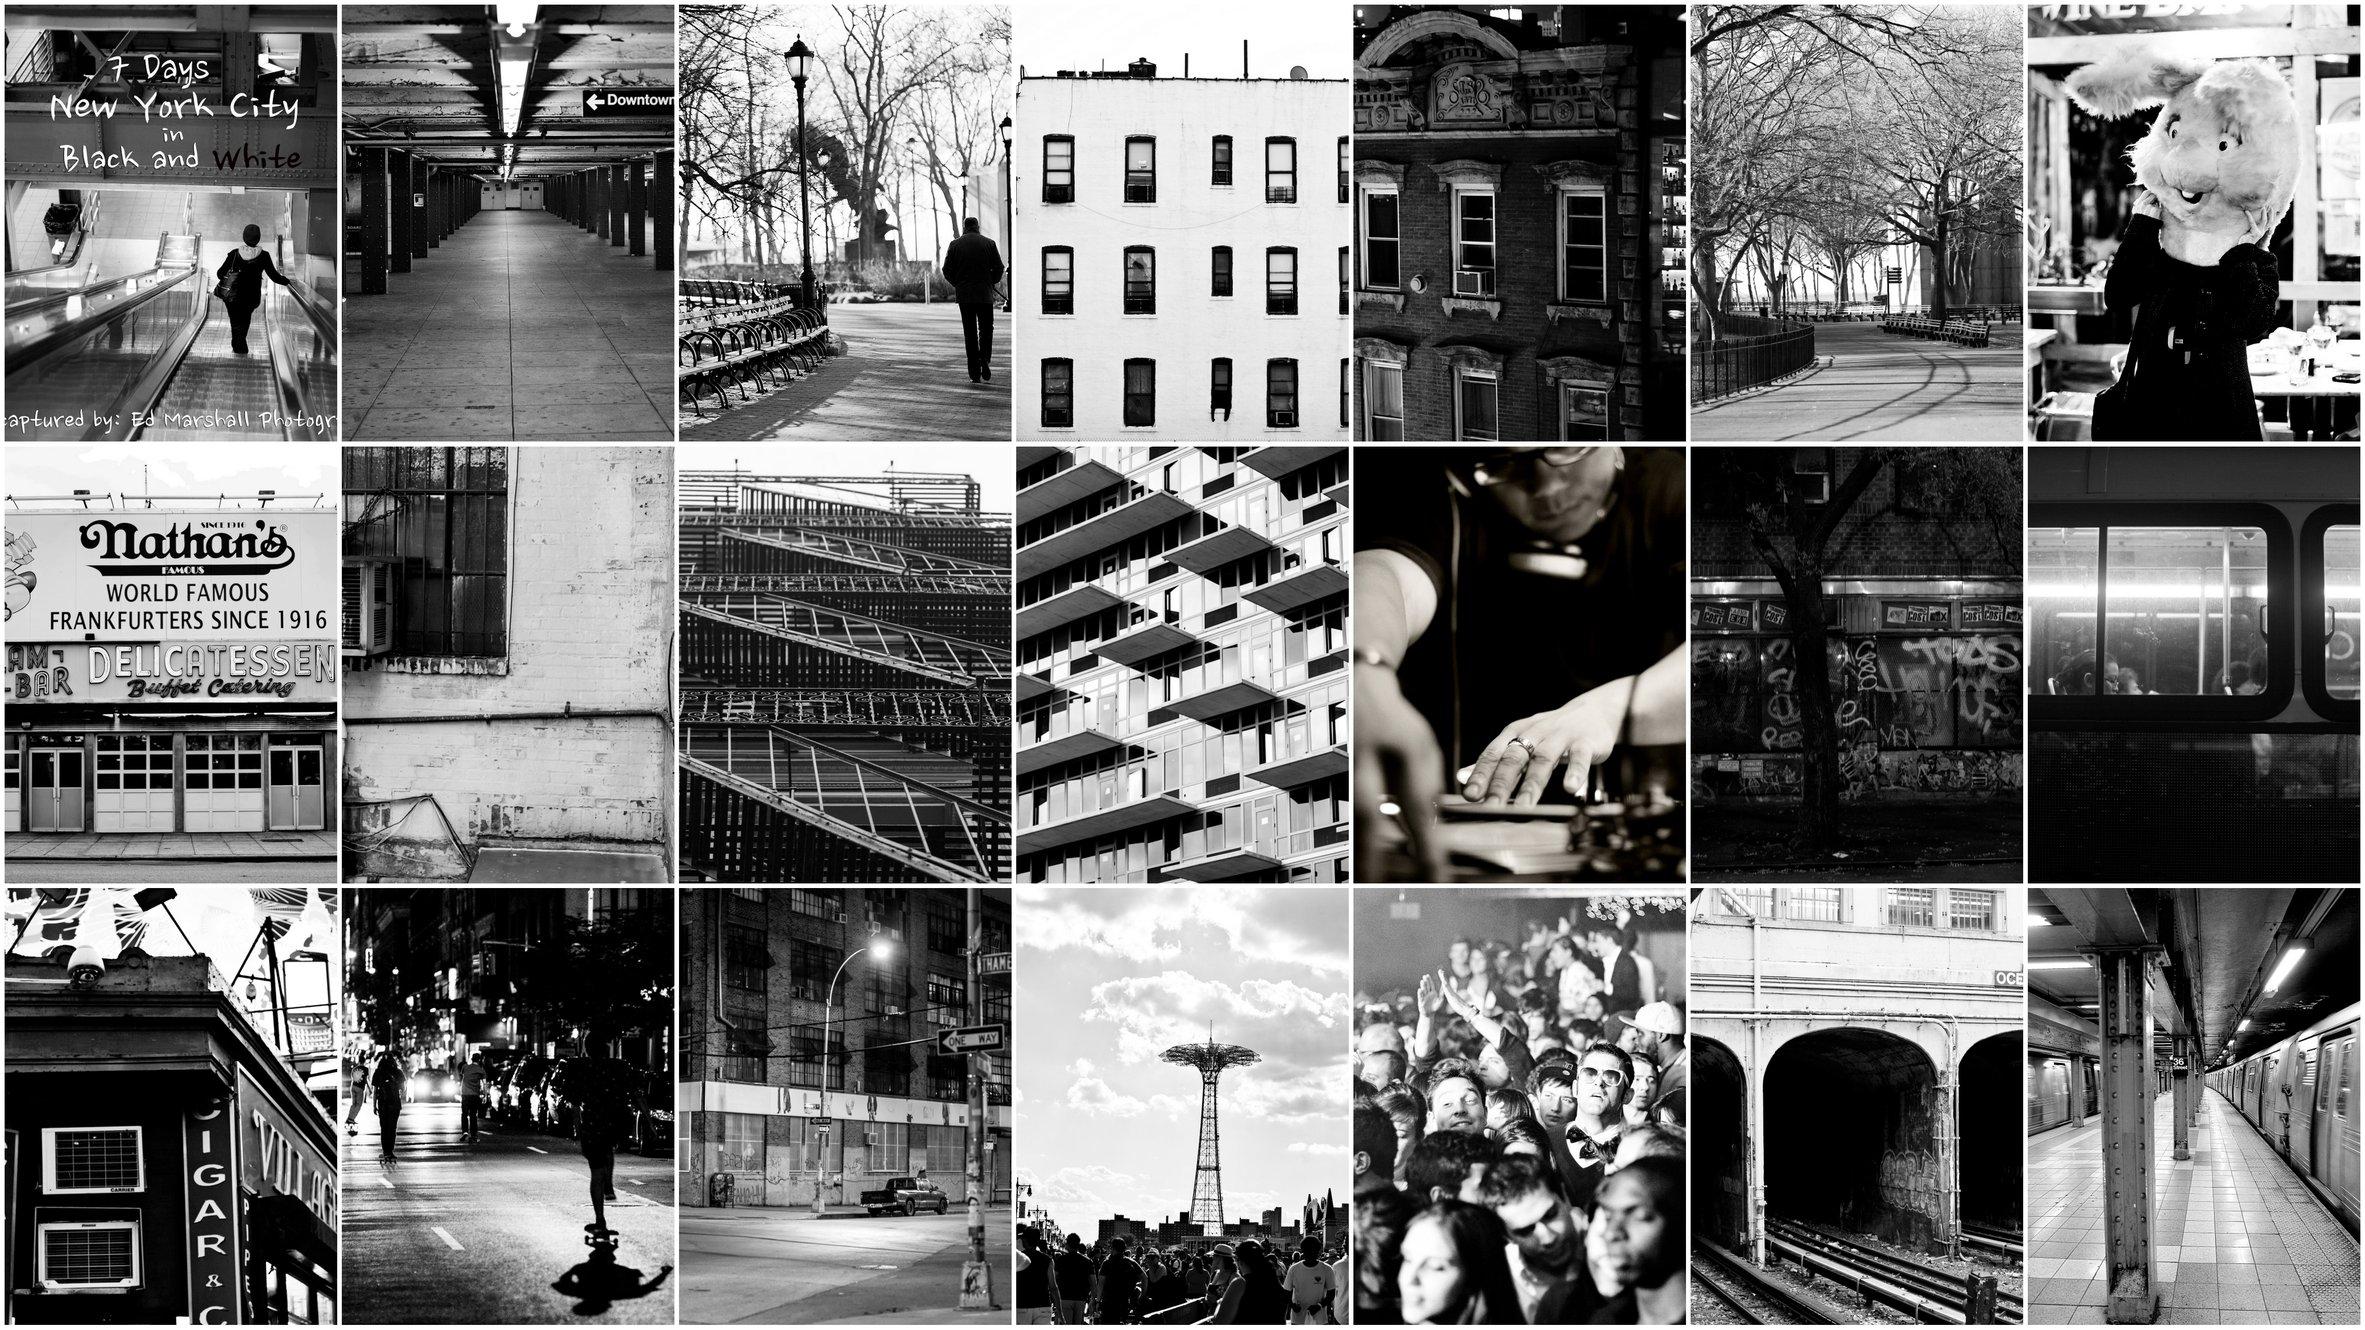 7 Days New York City In Black White